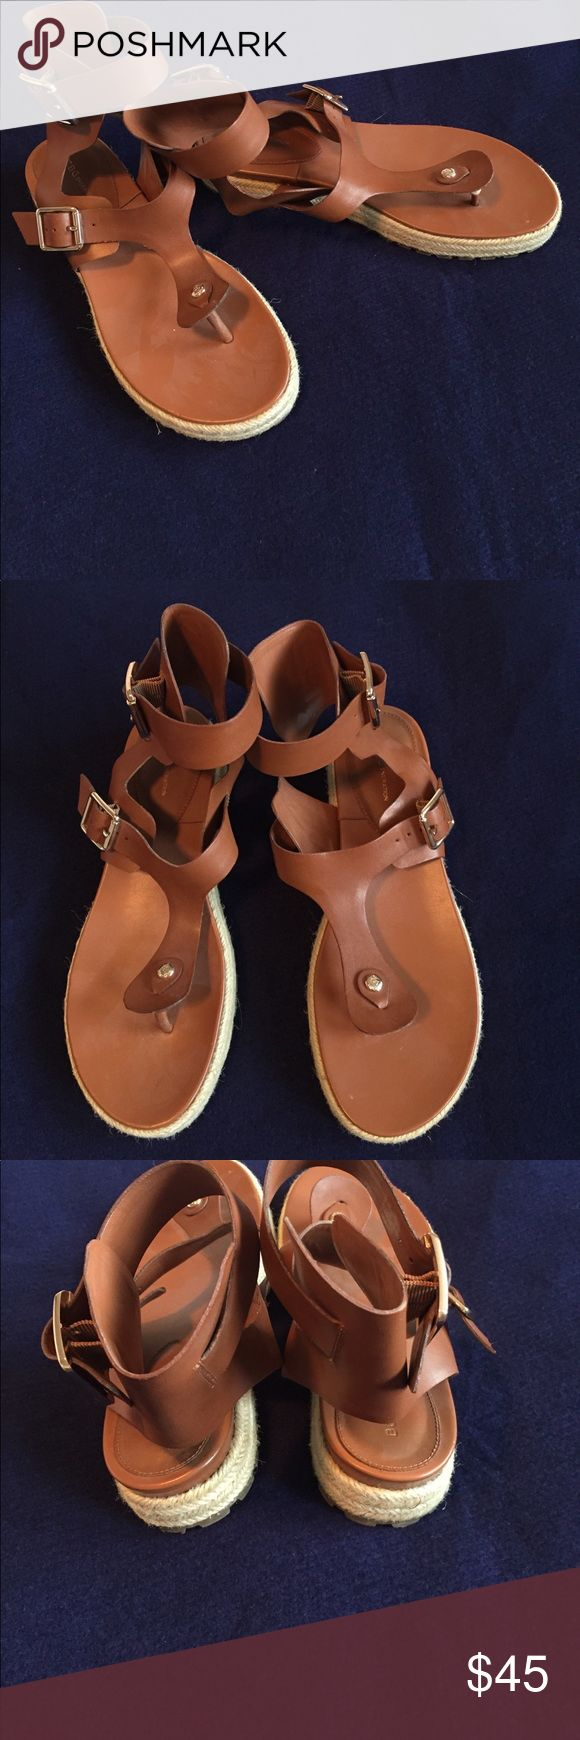 BCBGeneration toffee Edmund leather sandal size 8